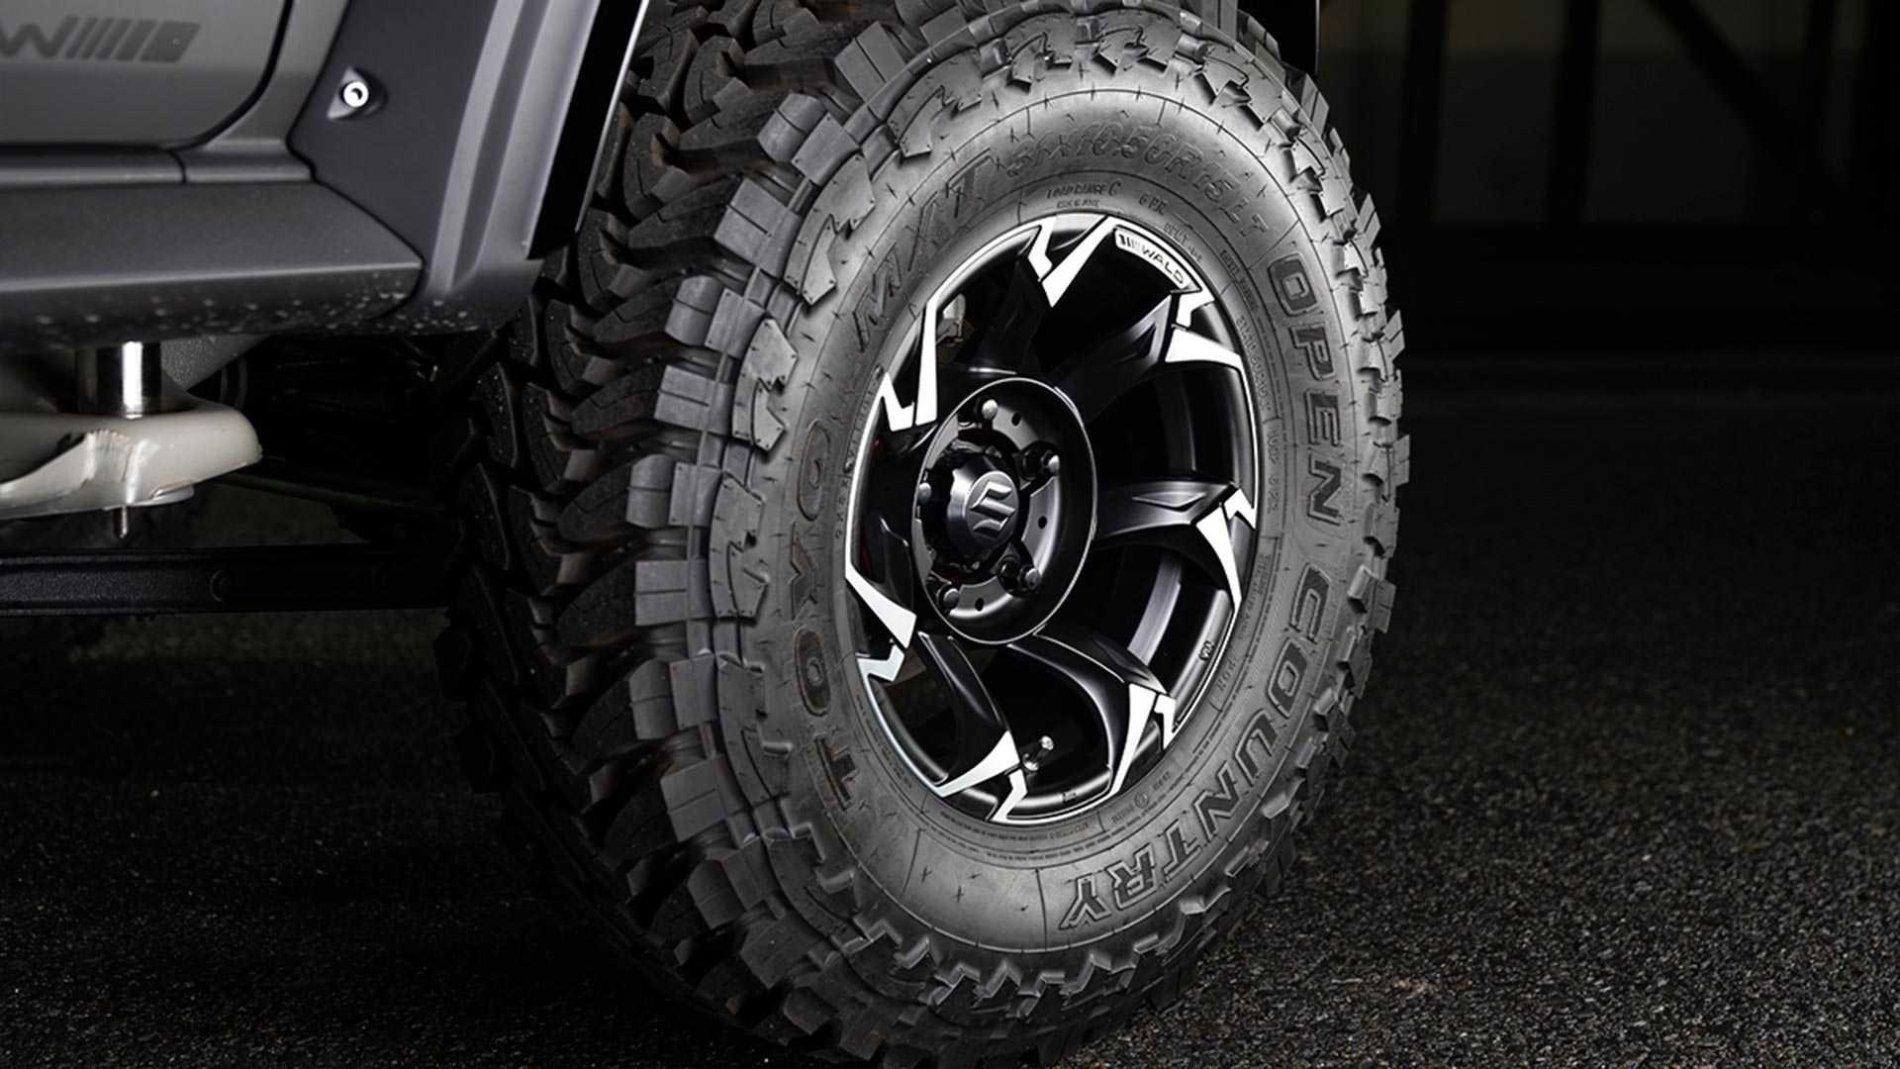 Suzuki Jimny Black Bison Edition - Suzuki Jimny Black Bison Edition